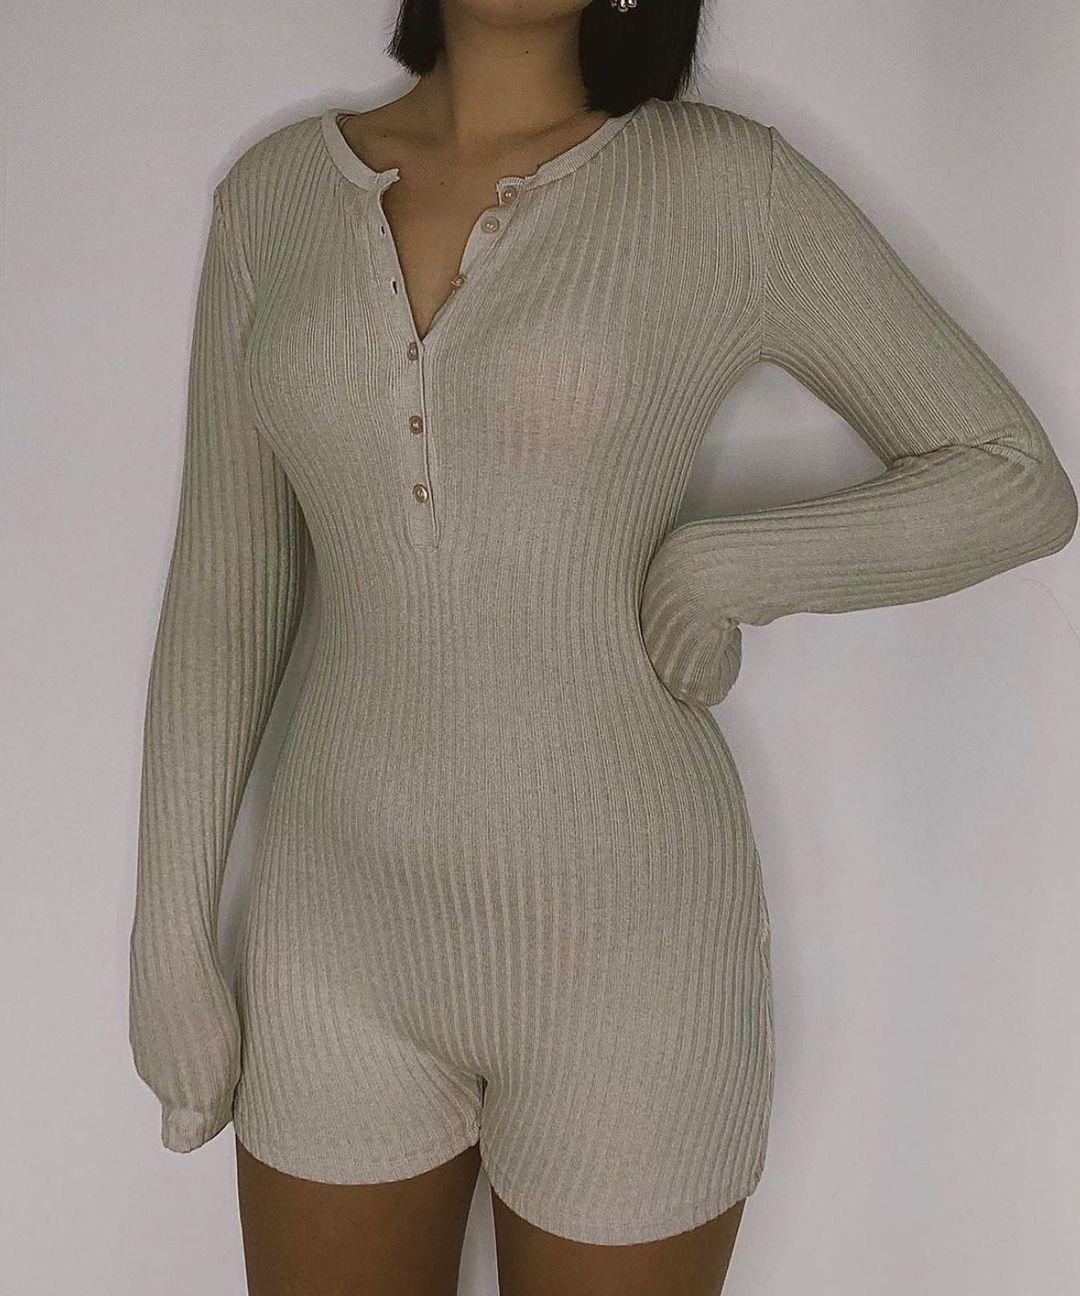 ribbed jumpsuit de Zara sur zara.style.daily